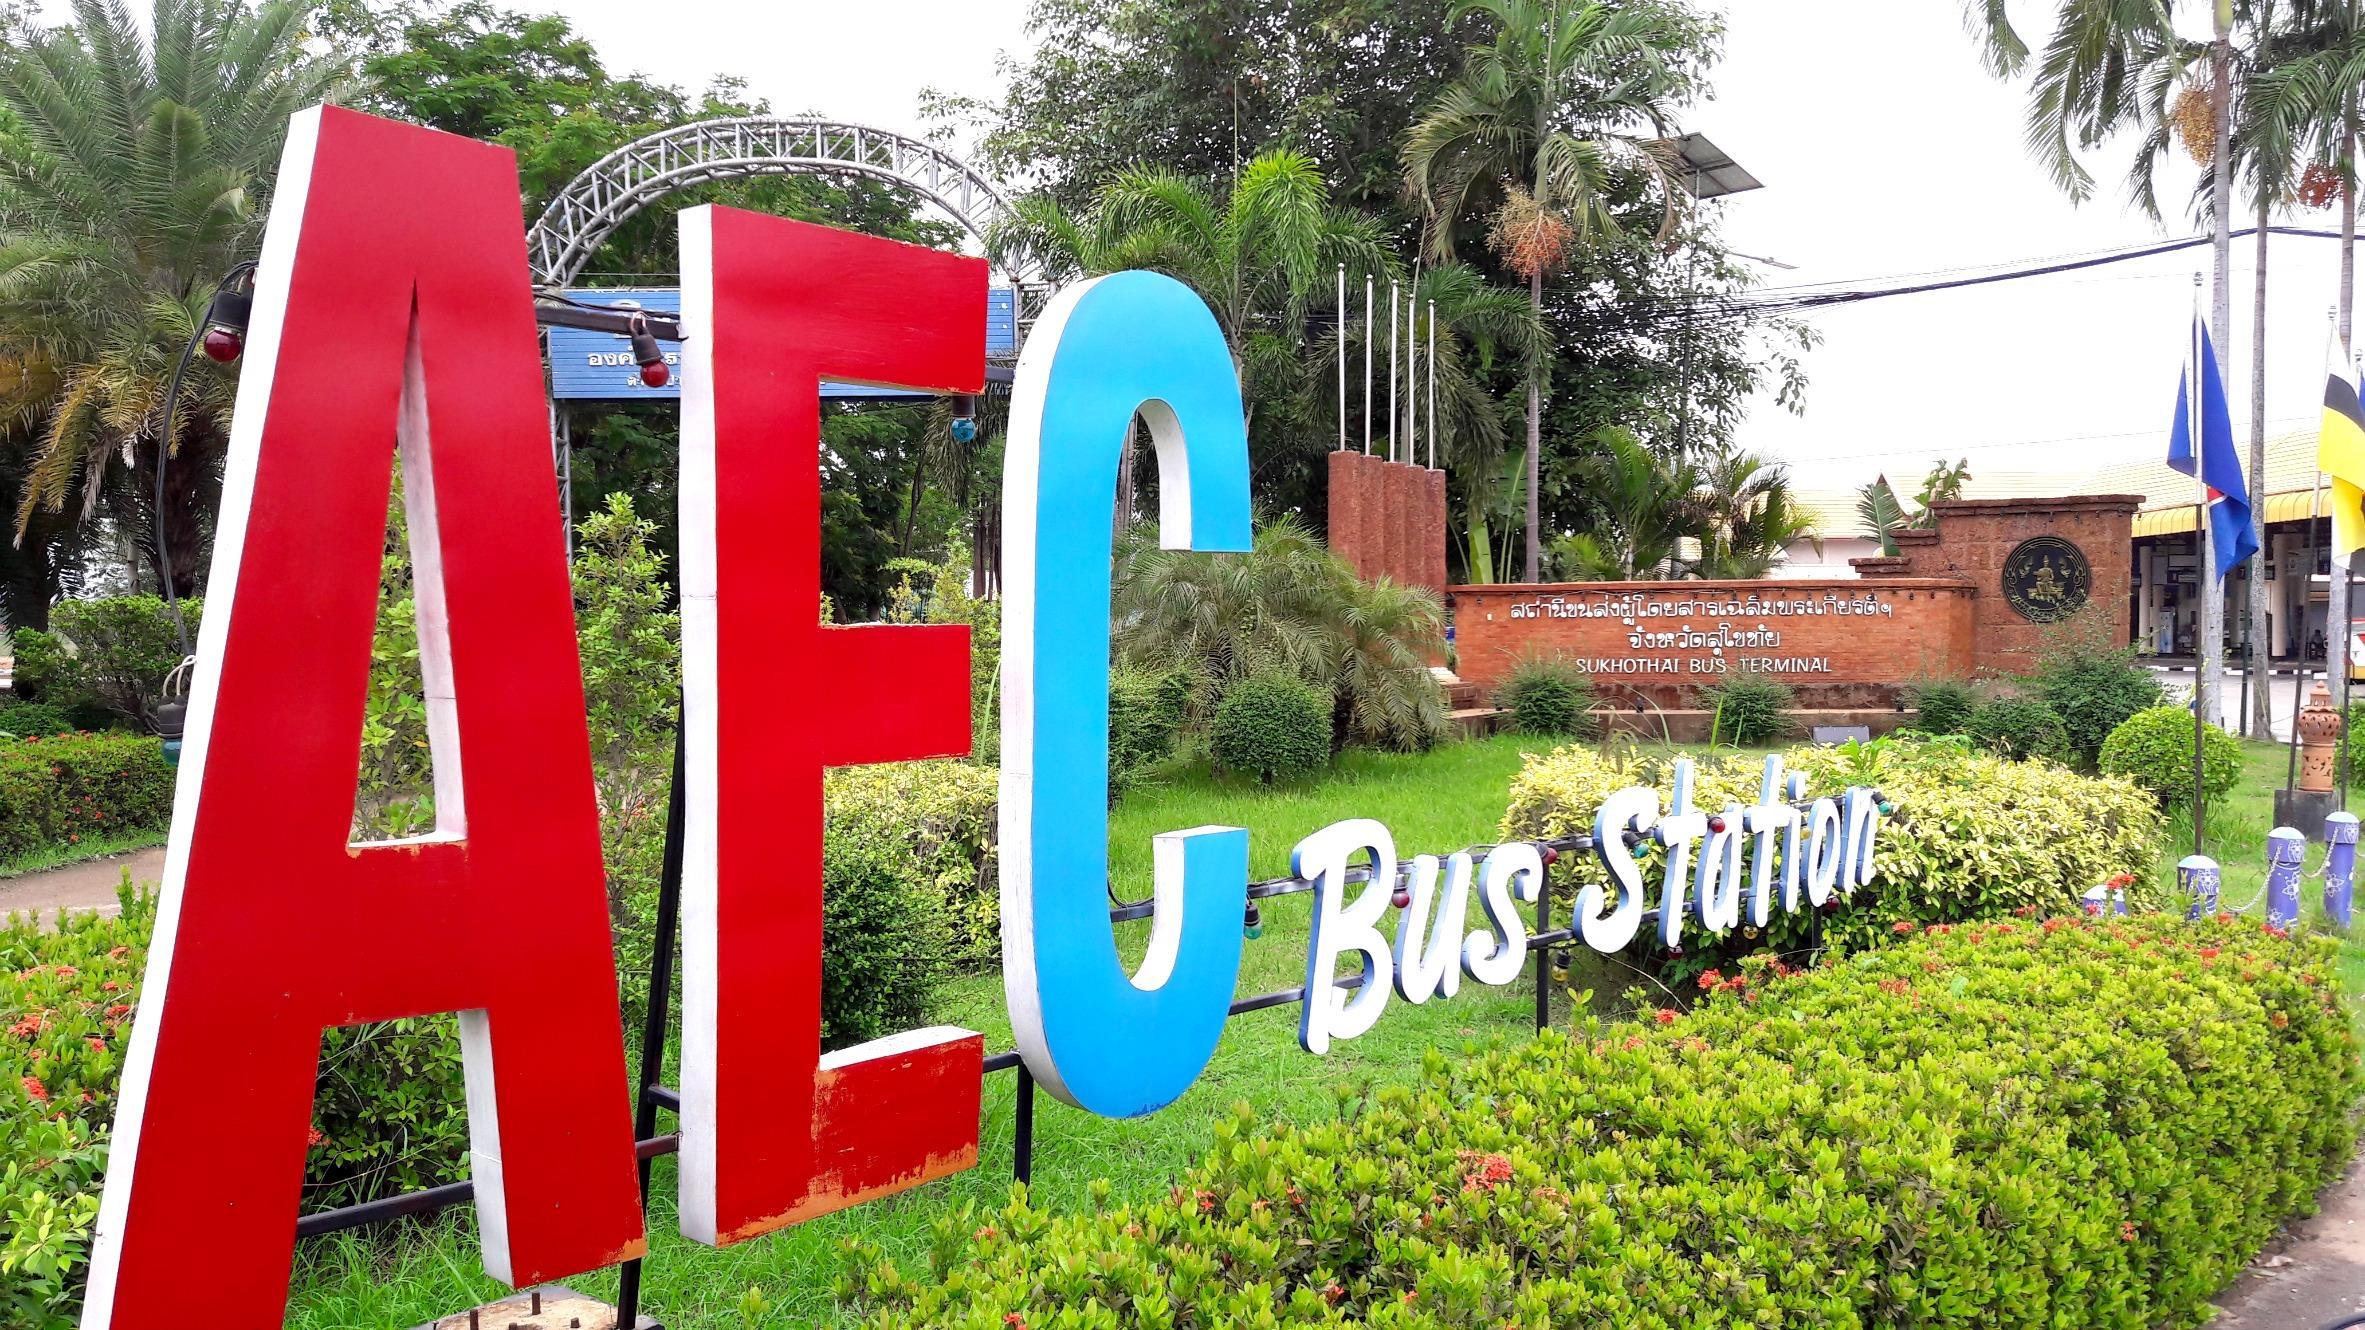 Sukhothai Bus Station - Sign 3